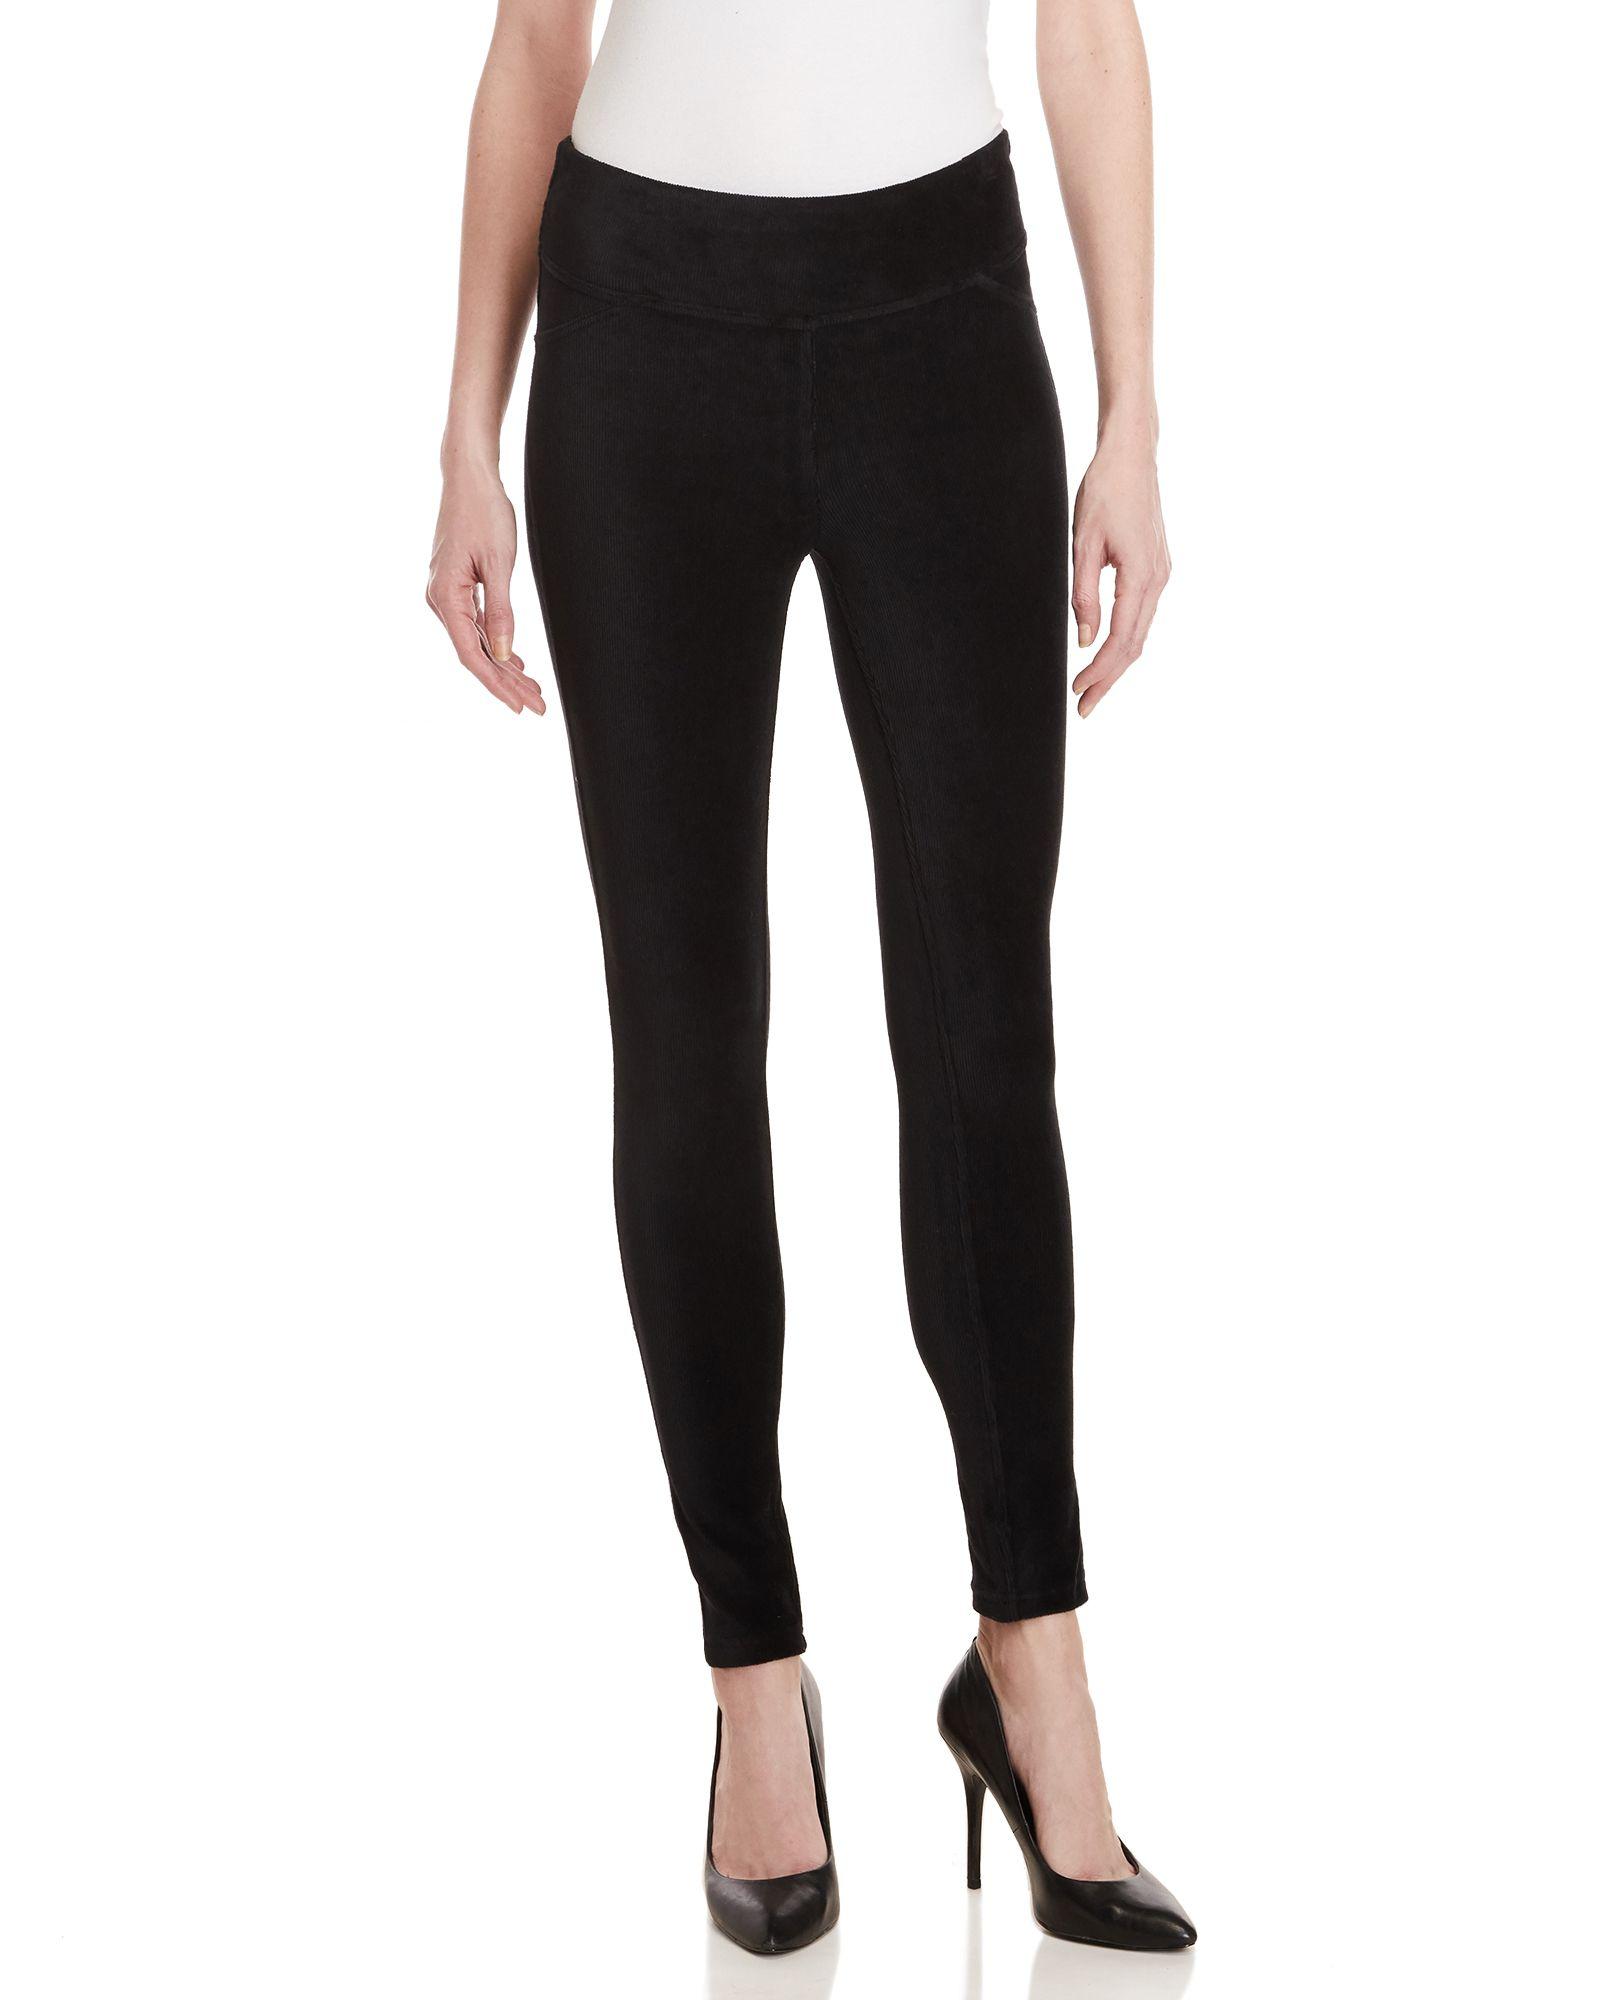 5003ef8361 HUE Women's Wide Wale Corduroy Legging HUE. $29.30. Legging. 66% Cotton/31%  Polyester/3% Spandex. Machine Wash. Cordu… | Clothing & Accessories - Women  ...